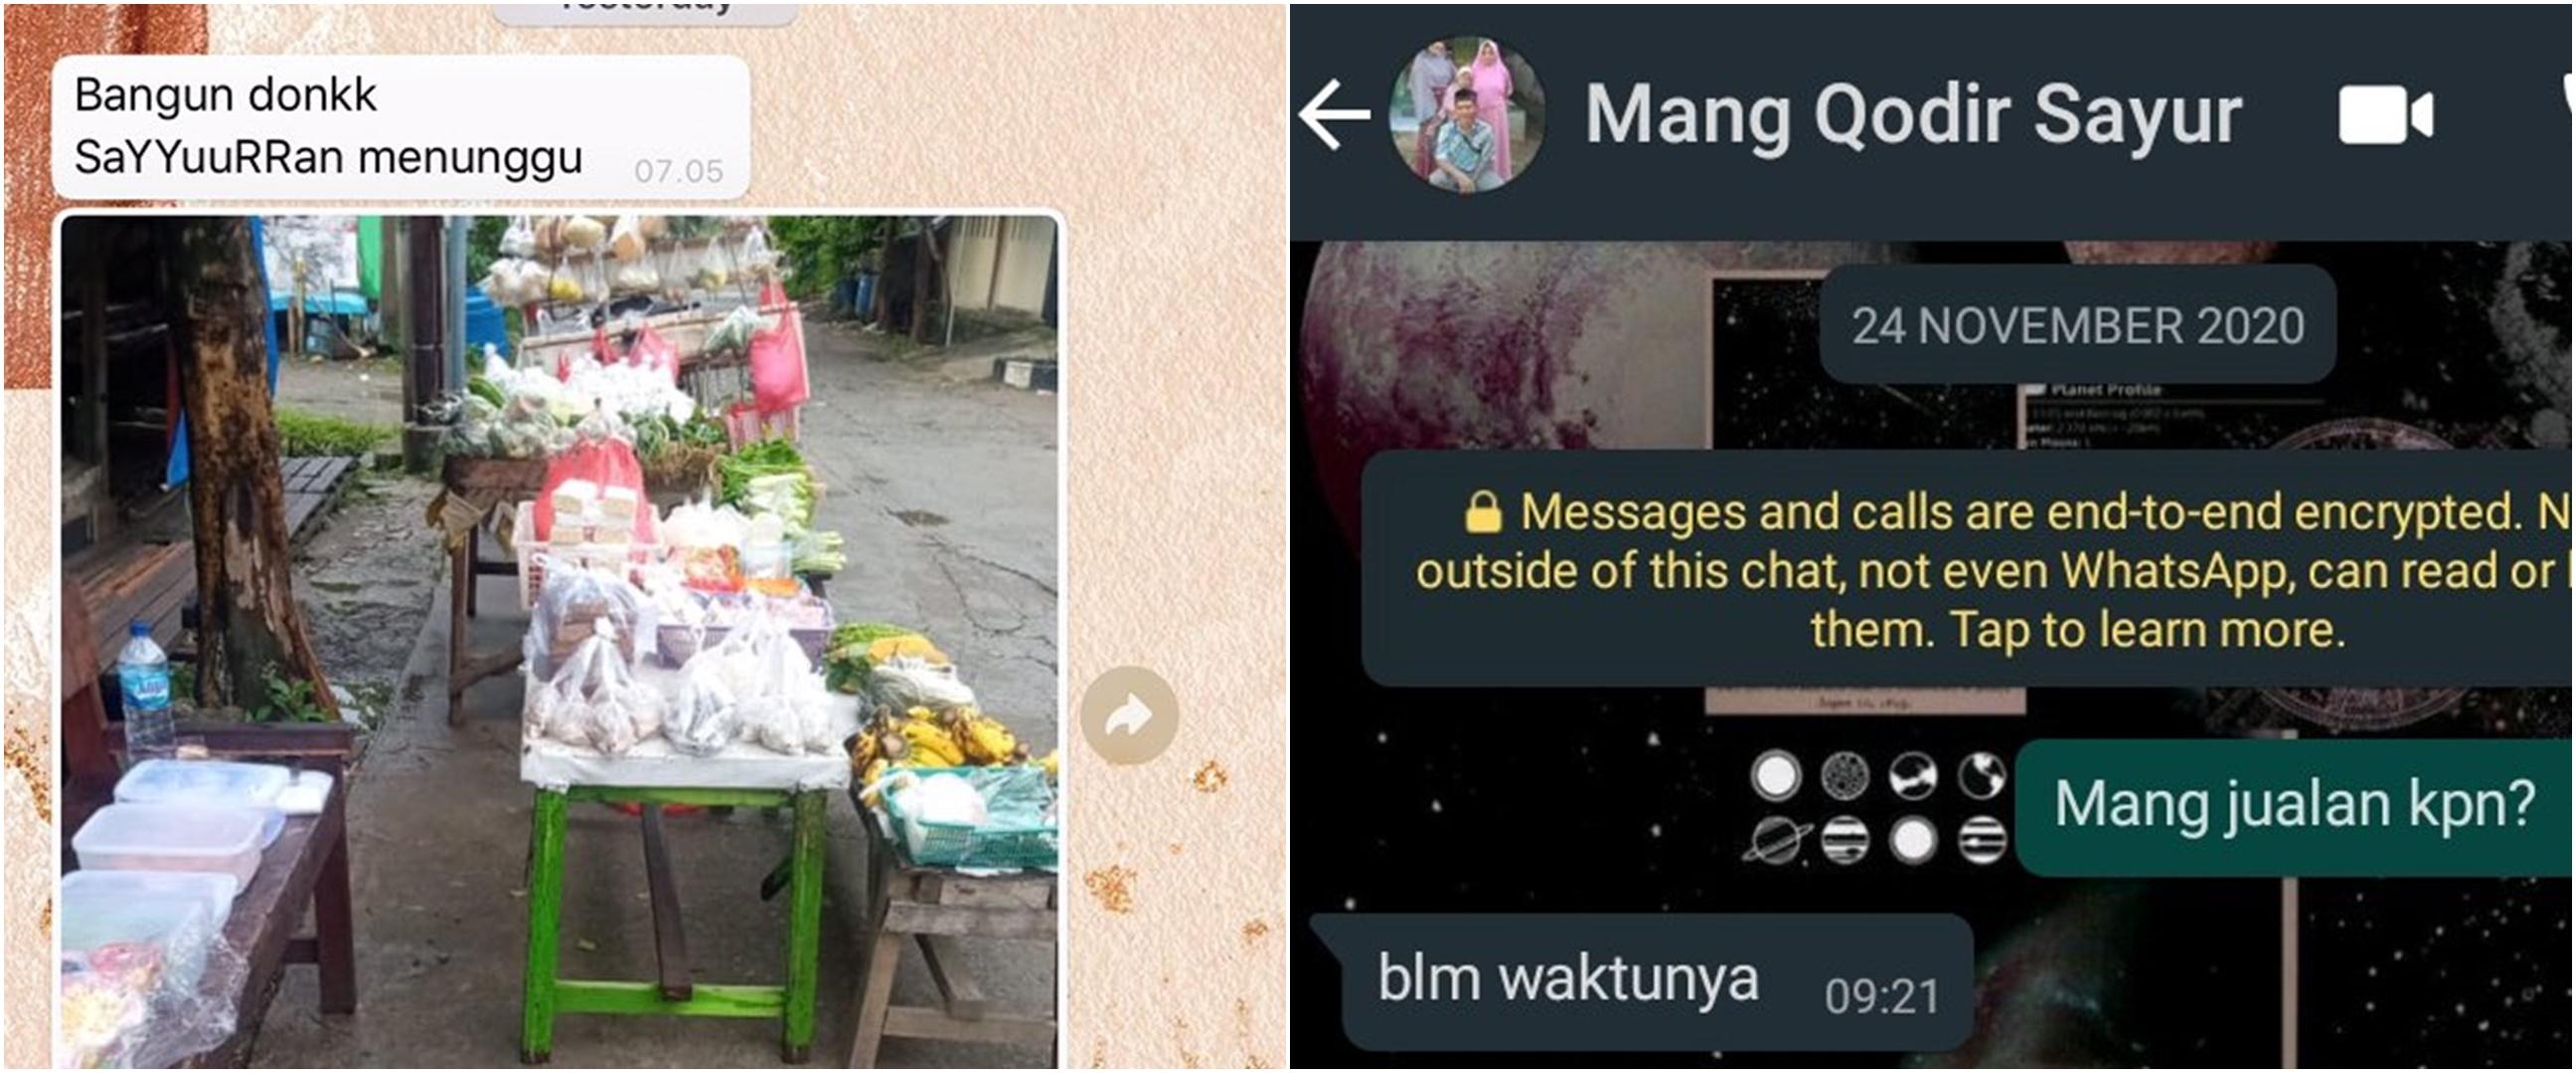 10 Chat WhatsApp lucu dengan tukang sayur ini endingnya bikin ngakak